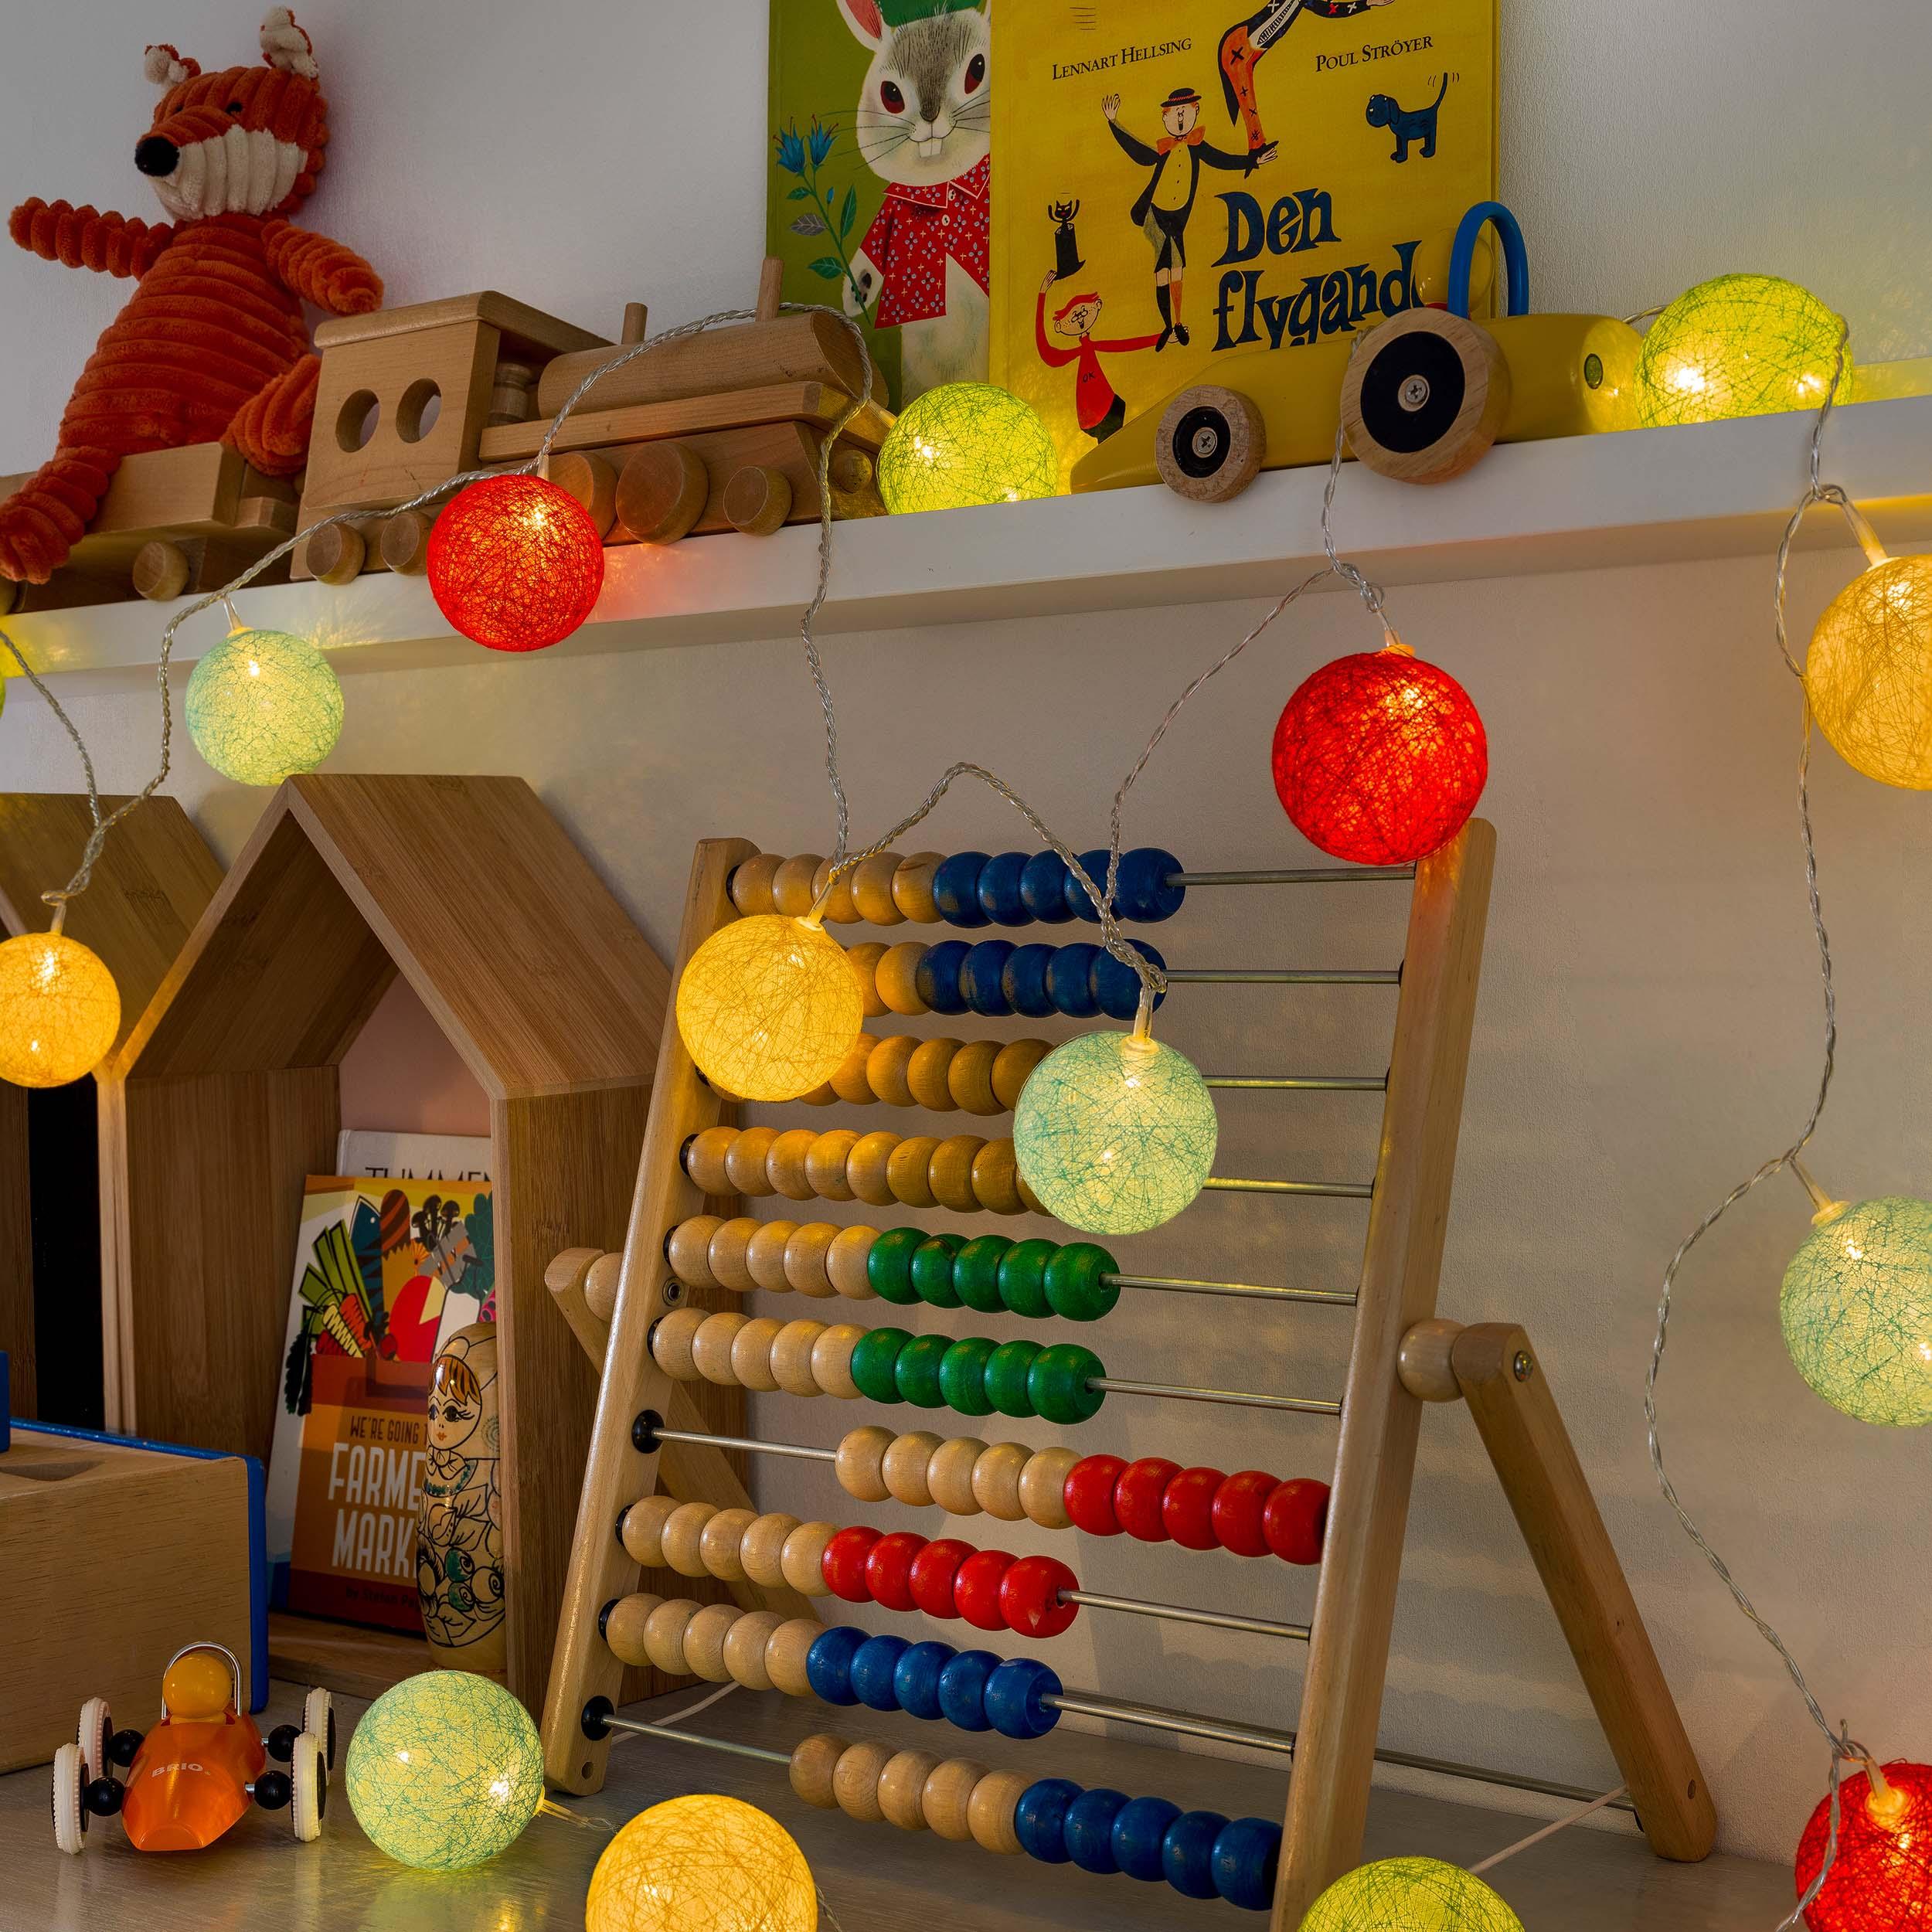 Konstsmide LED-Dekolichterkette, bunte Baumwollkugeln, 6 cm 3136-503